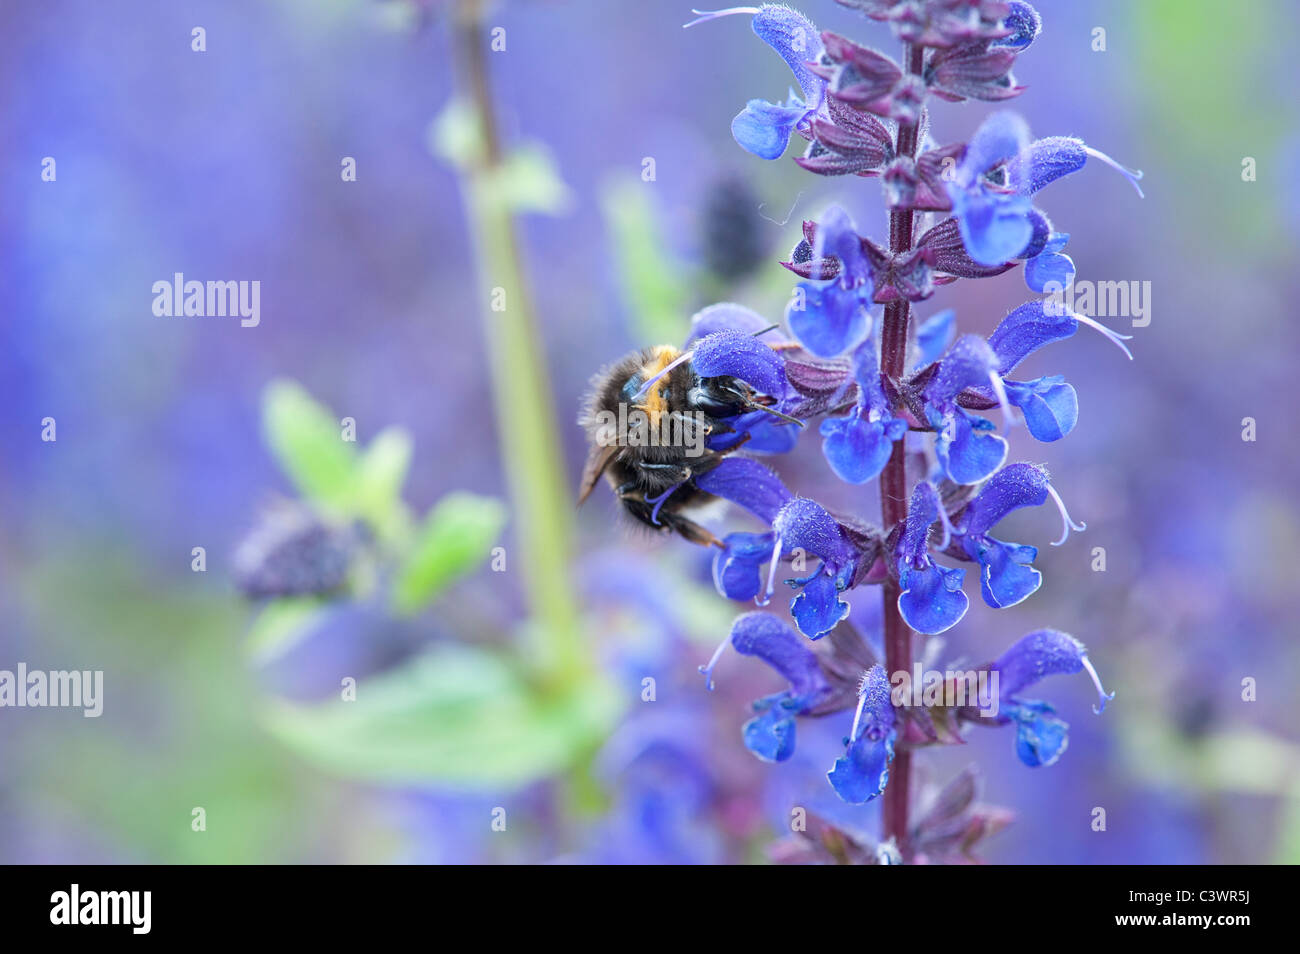 Bombus Lucorum. Bumble bee on a Salvia flower in an english garden - Stock Image